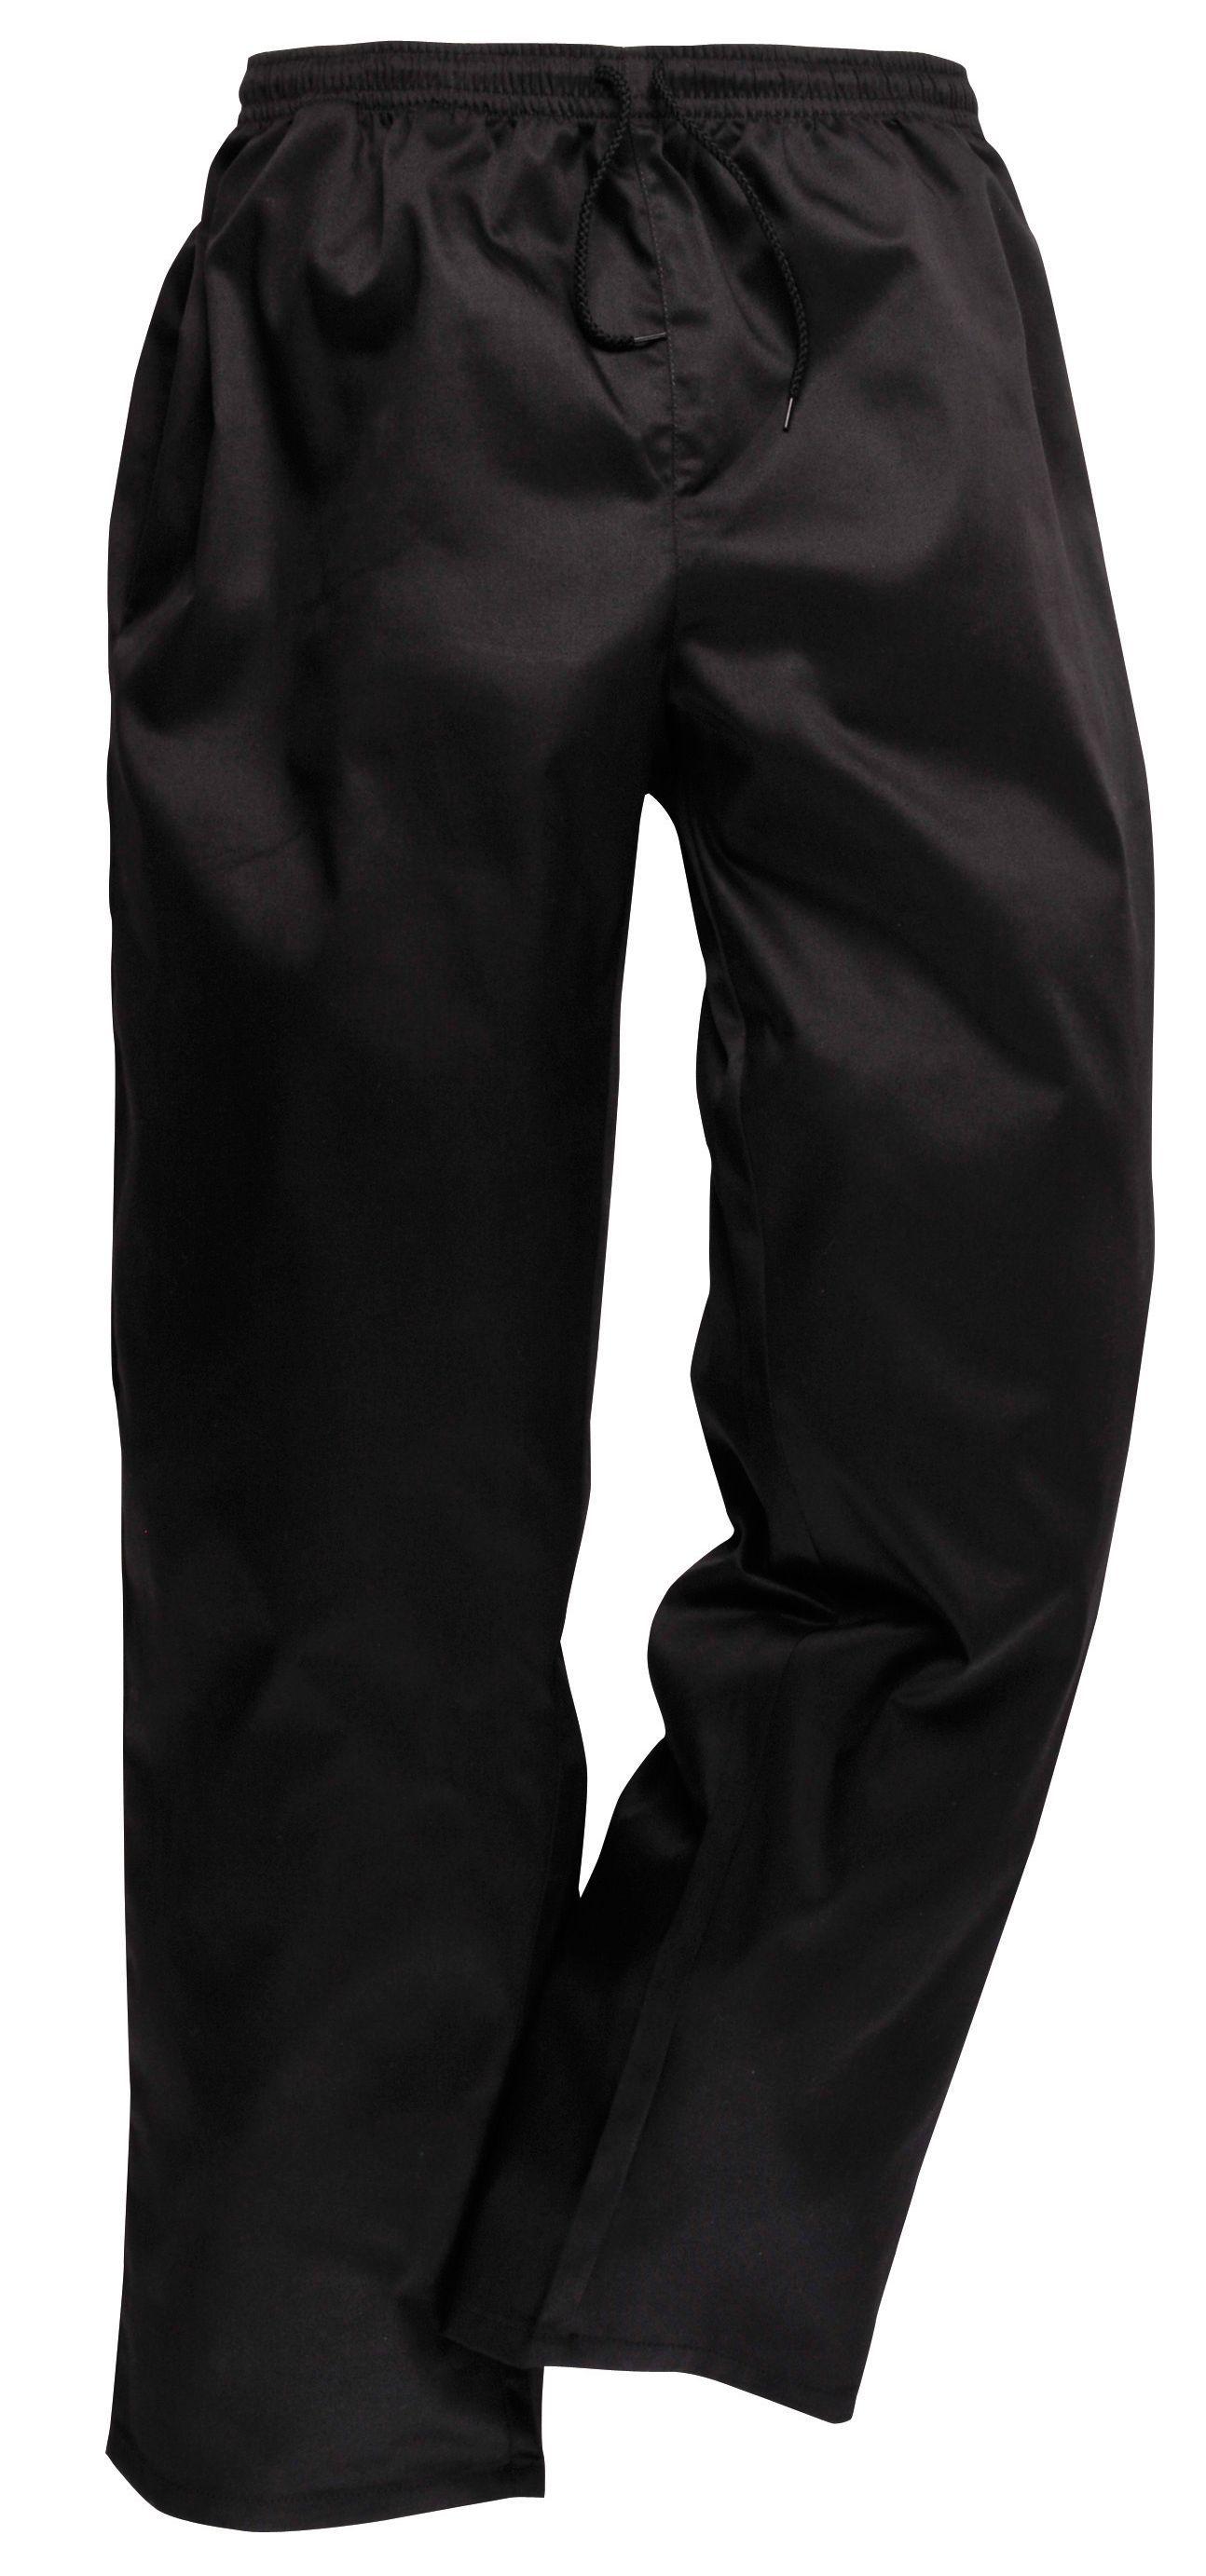 Nideen Pantalon de cuisinier unisexe Noir